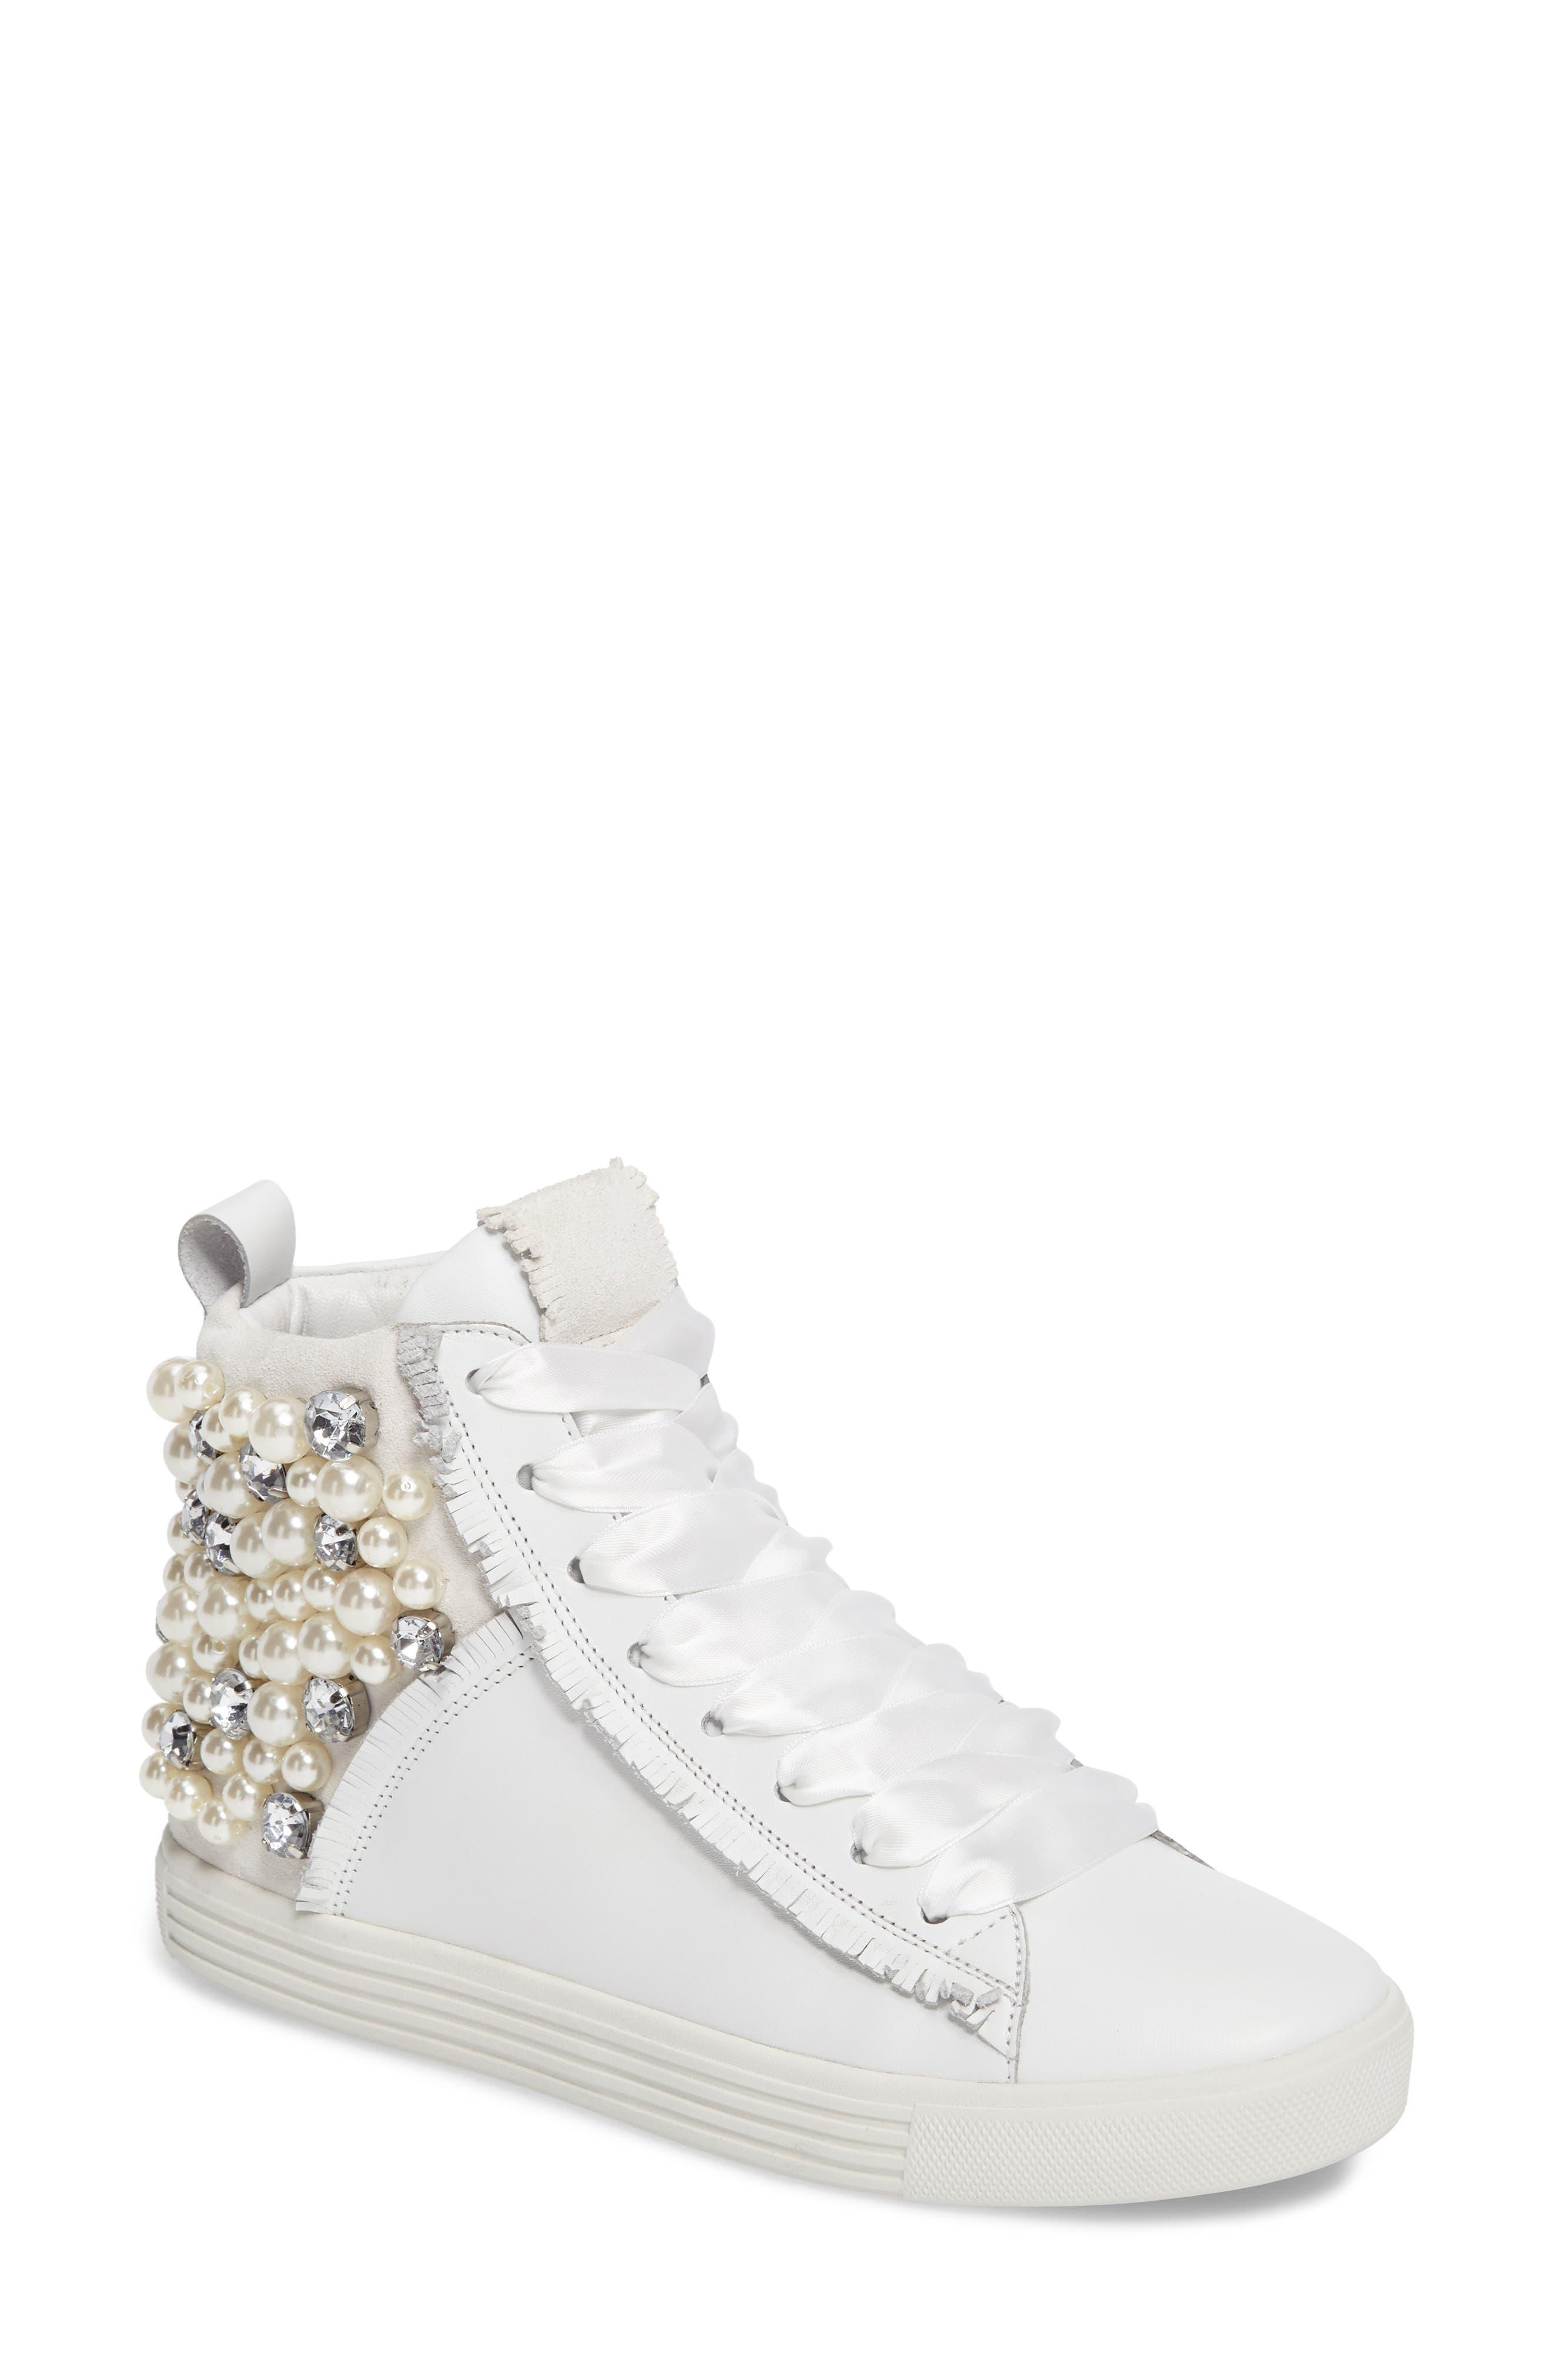 Alternate Image 1 Selected - Kennel & Schmenger Town Flower High Top Sneaker (Women)